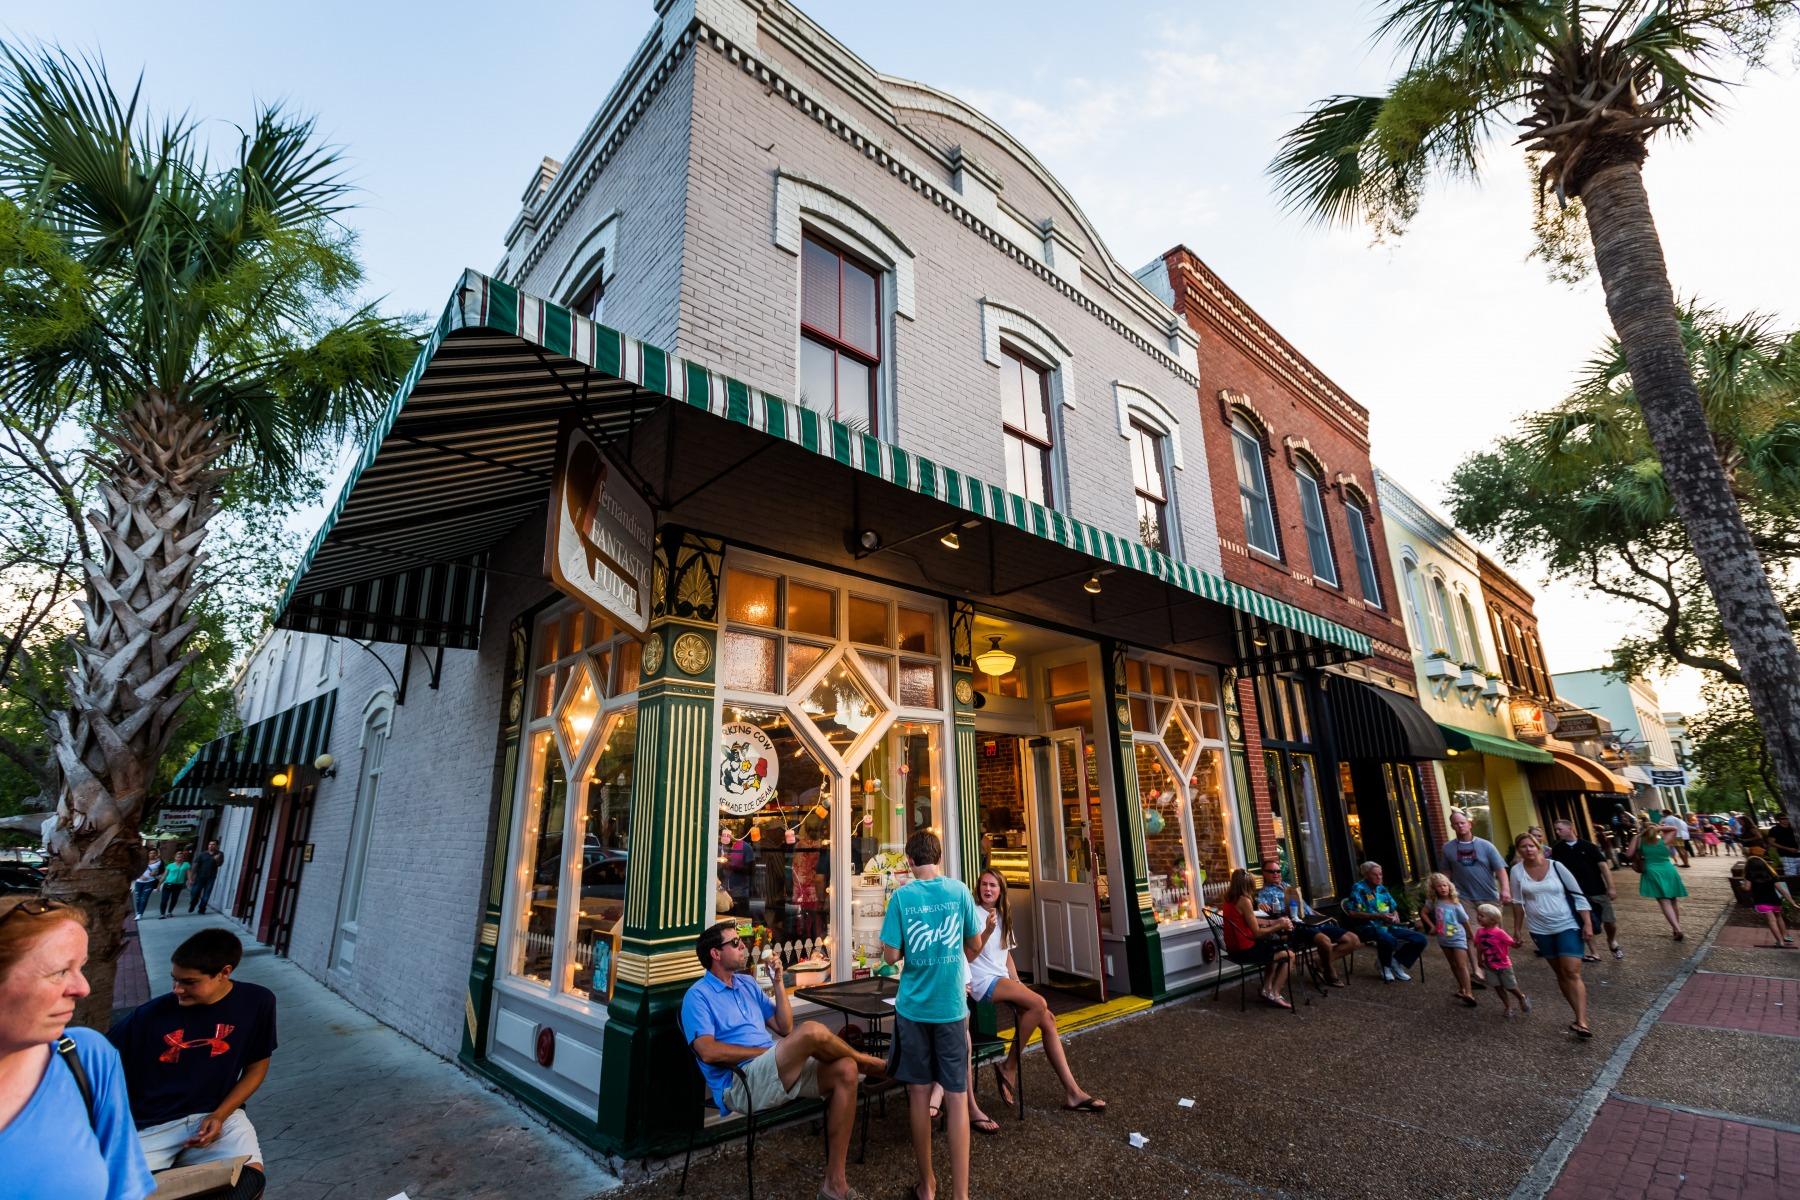 Historic Downtown Fernandina Beach people walking around shops and restaurants